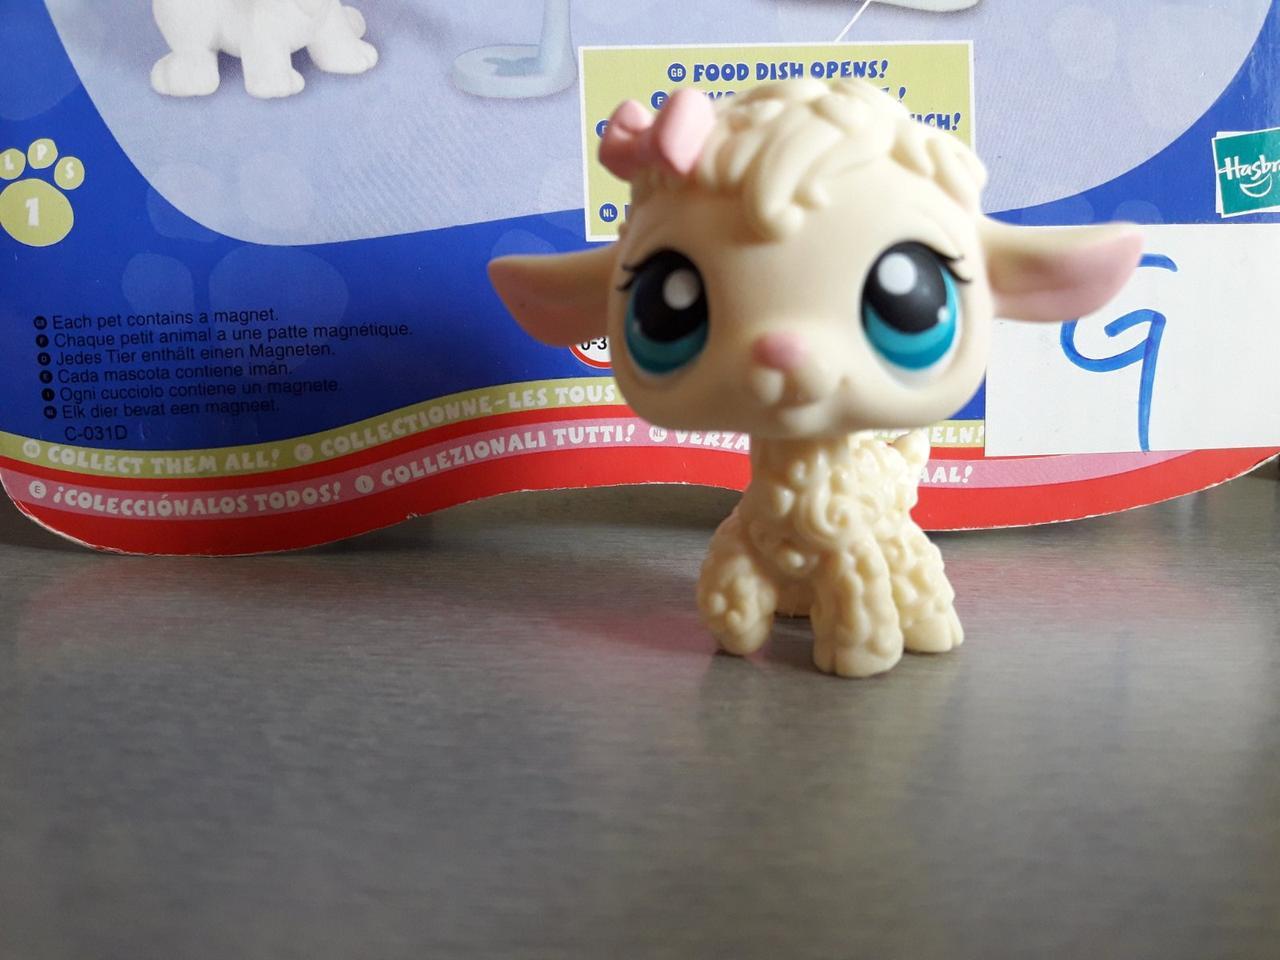 Lps littlest pet shop стоячки - лпс # 186 lamb Hasbro стара колекція - ягня